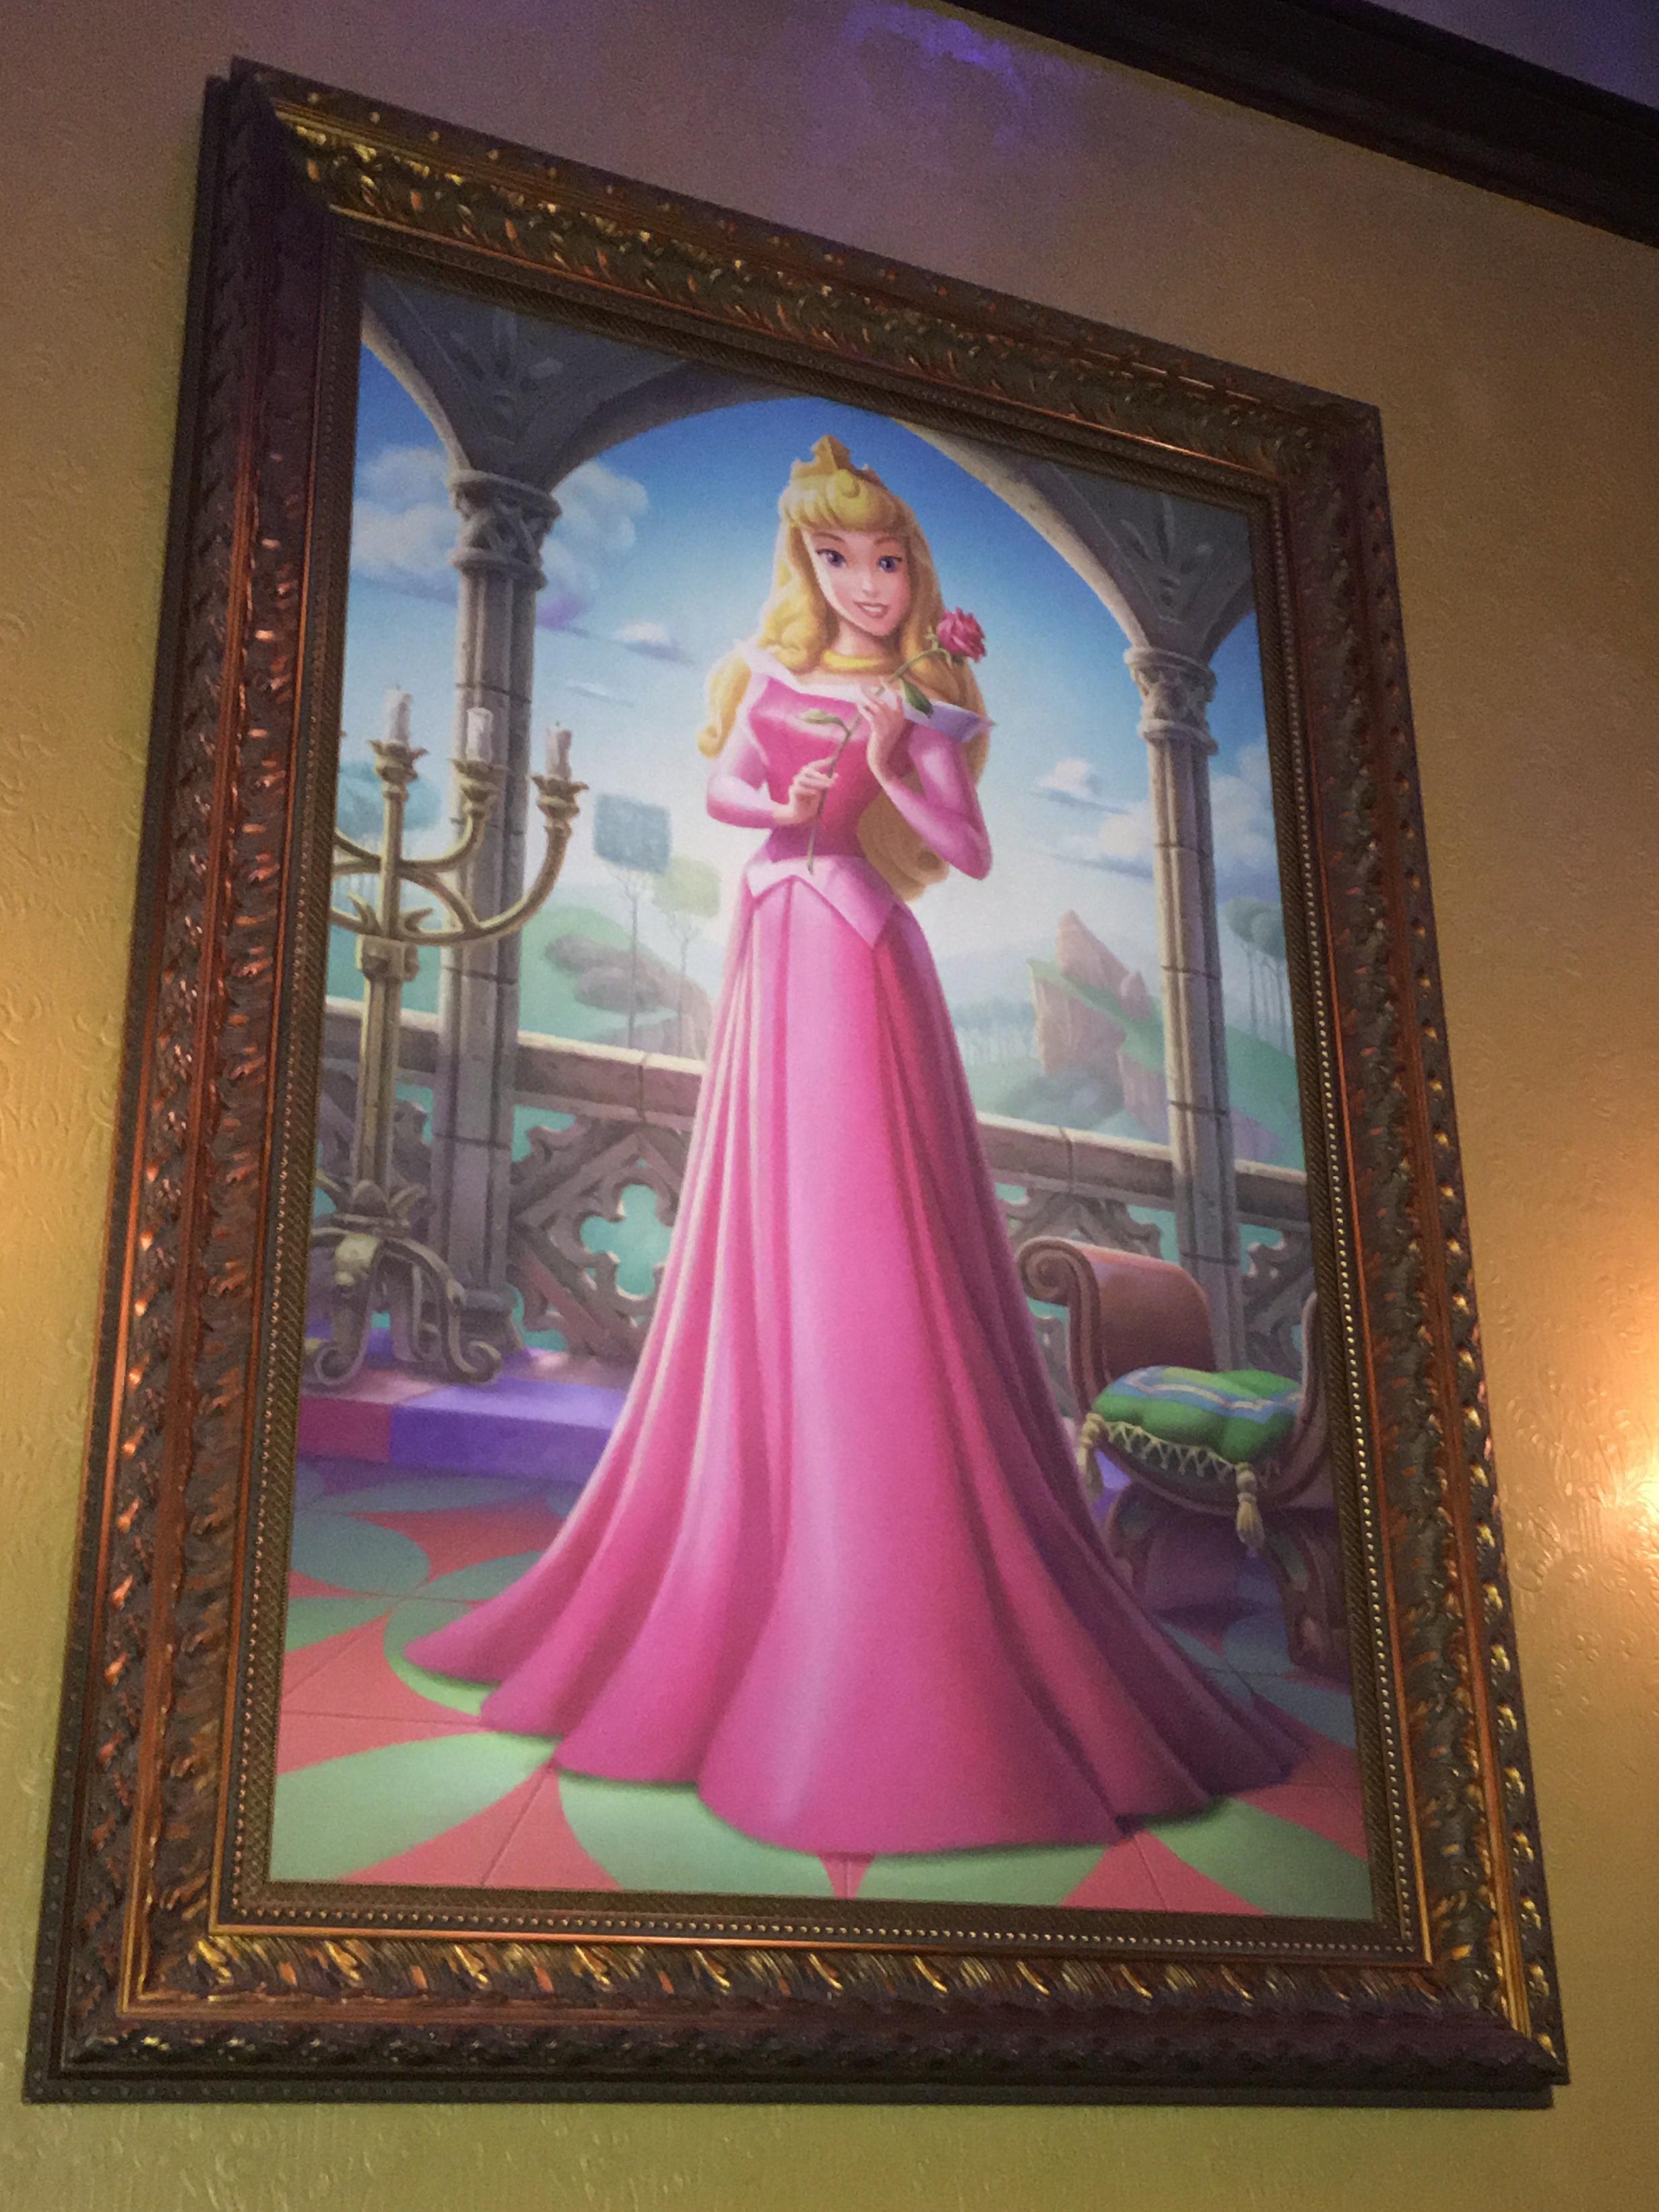 Sleeping Beauty portrait in Princess Fairytale Hall at Walt Disney World's Magic Kingdom